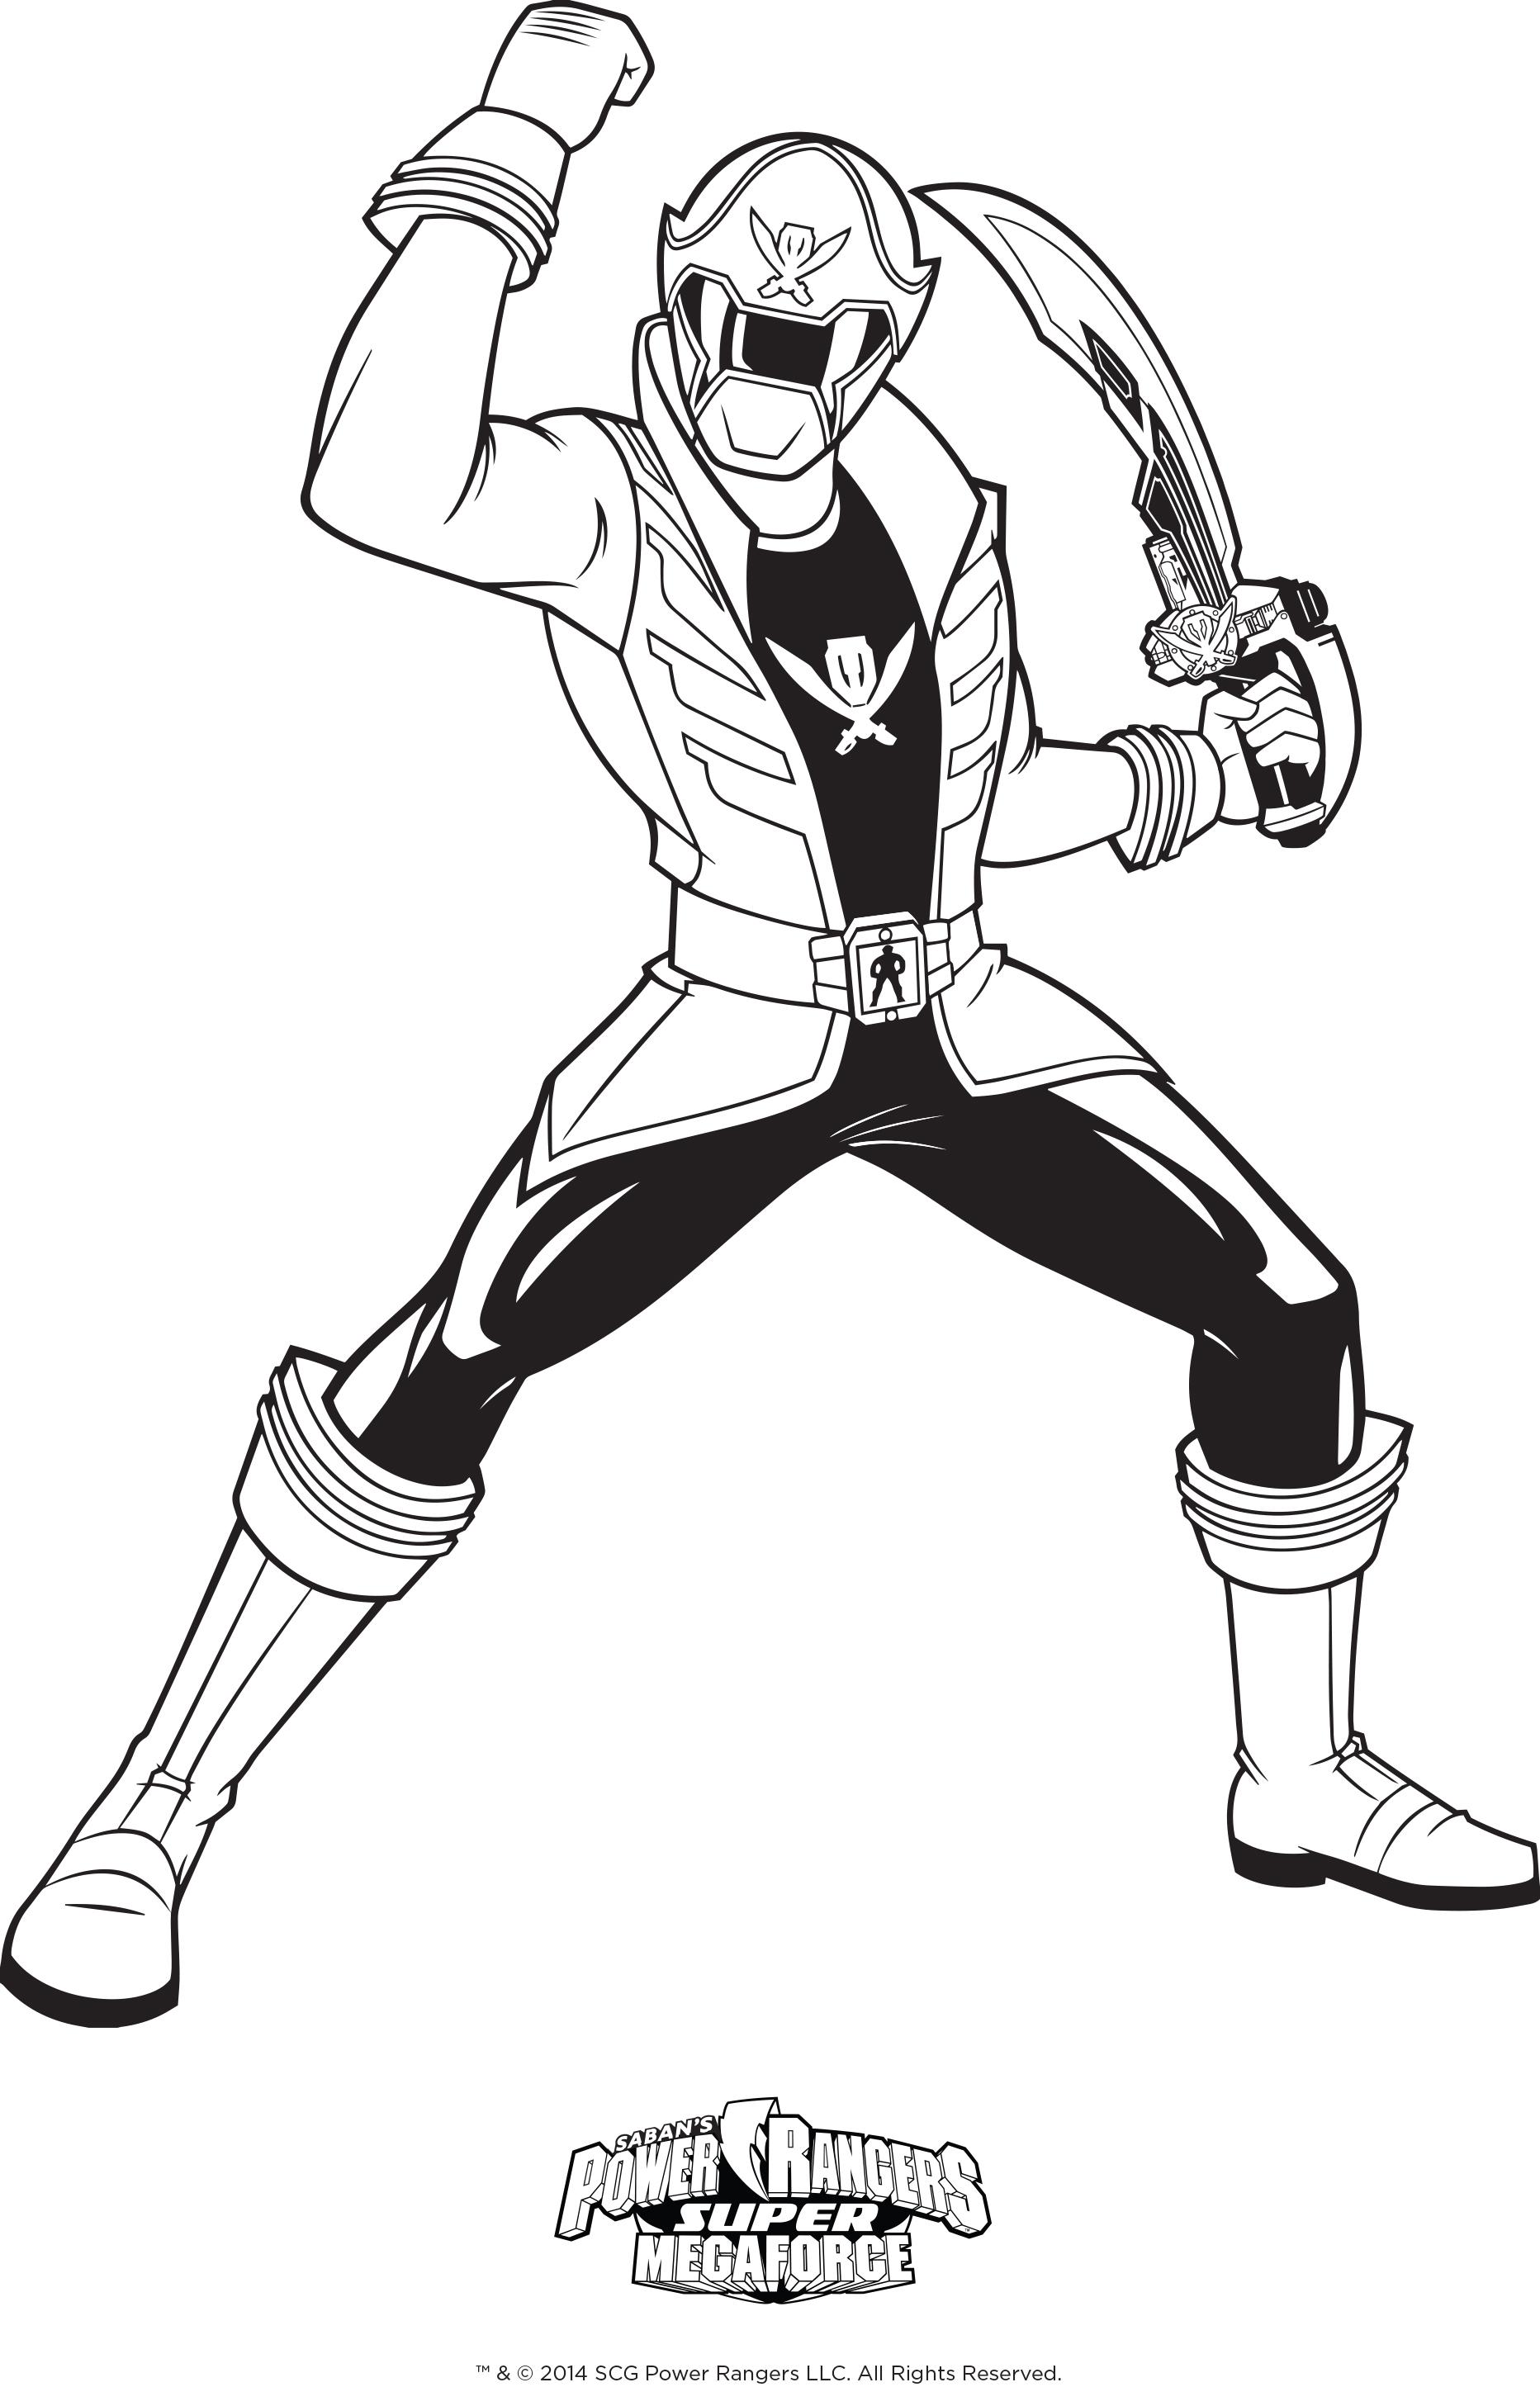 214 dibujos de Power rangers para colorear | Oh Kids | Page 2